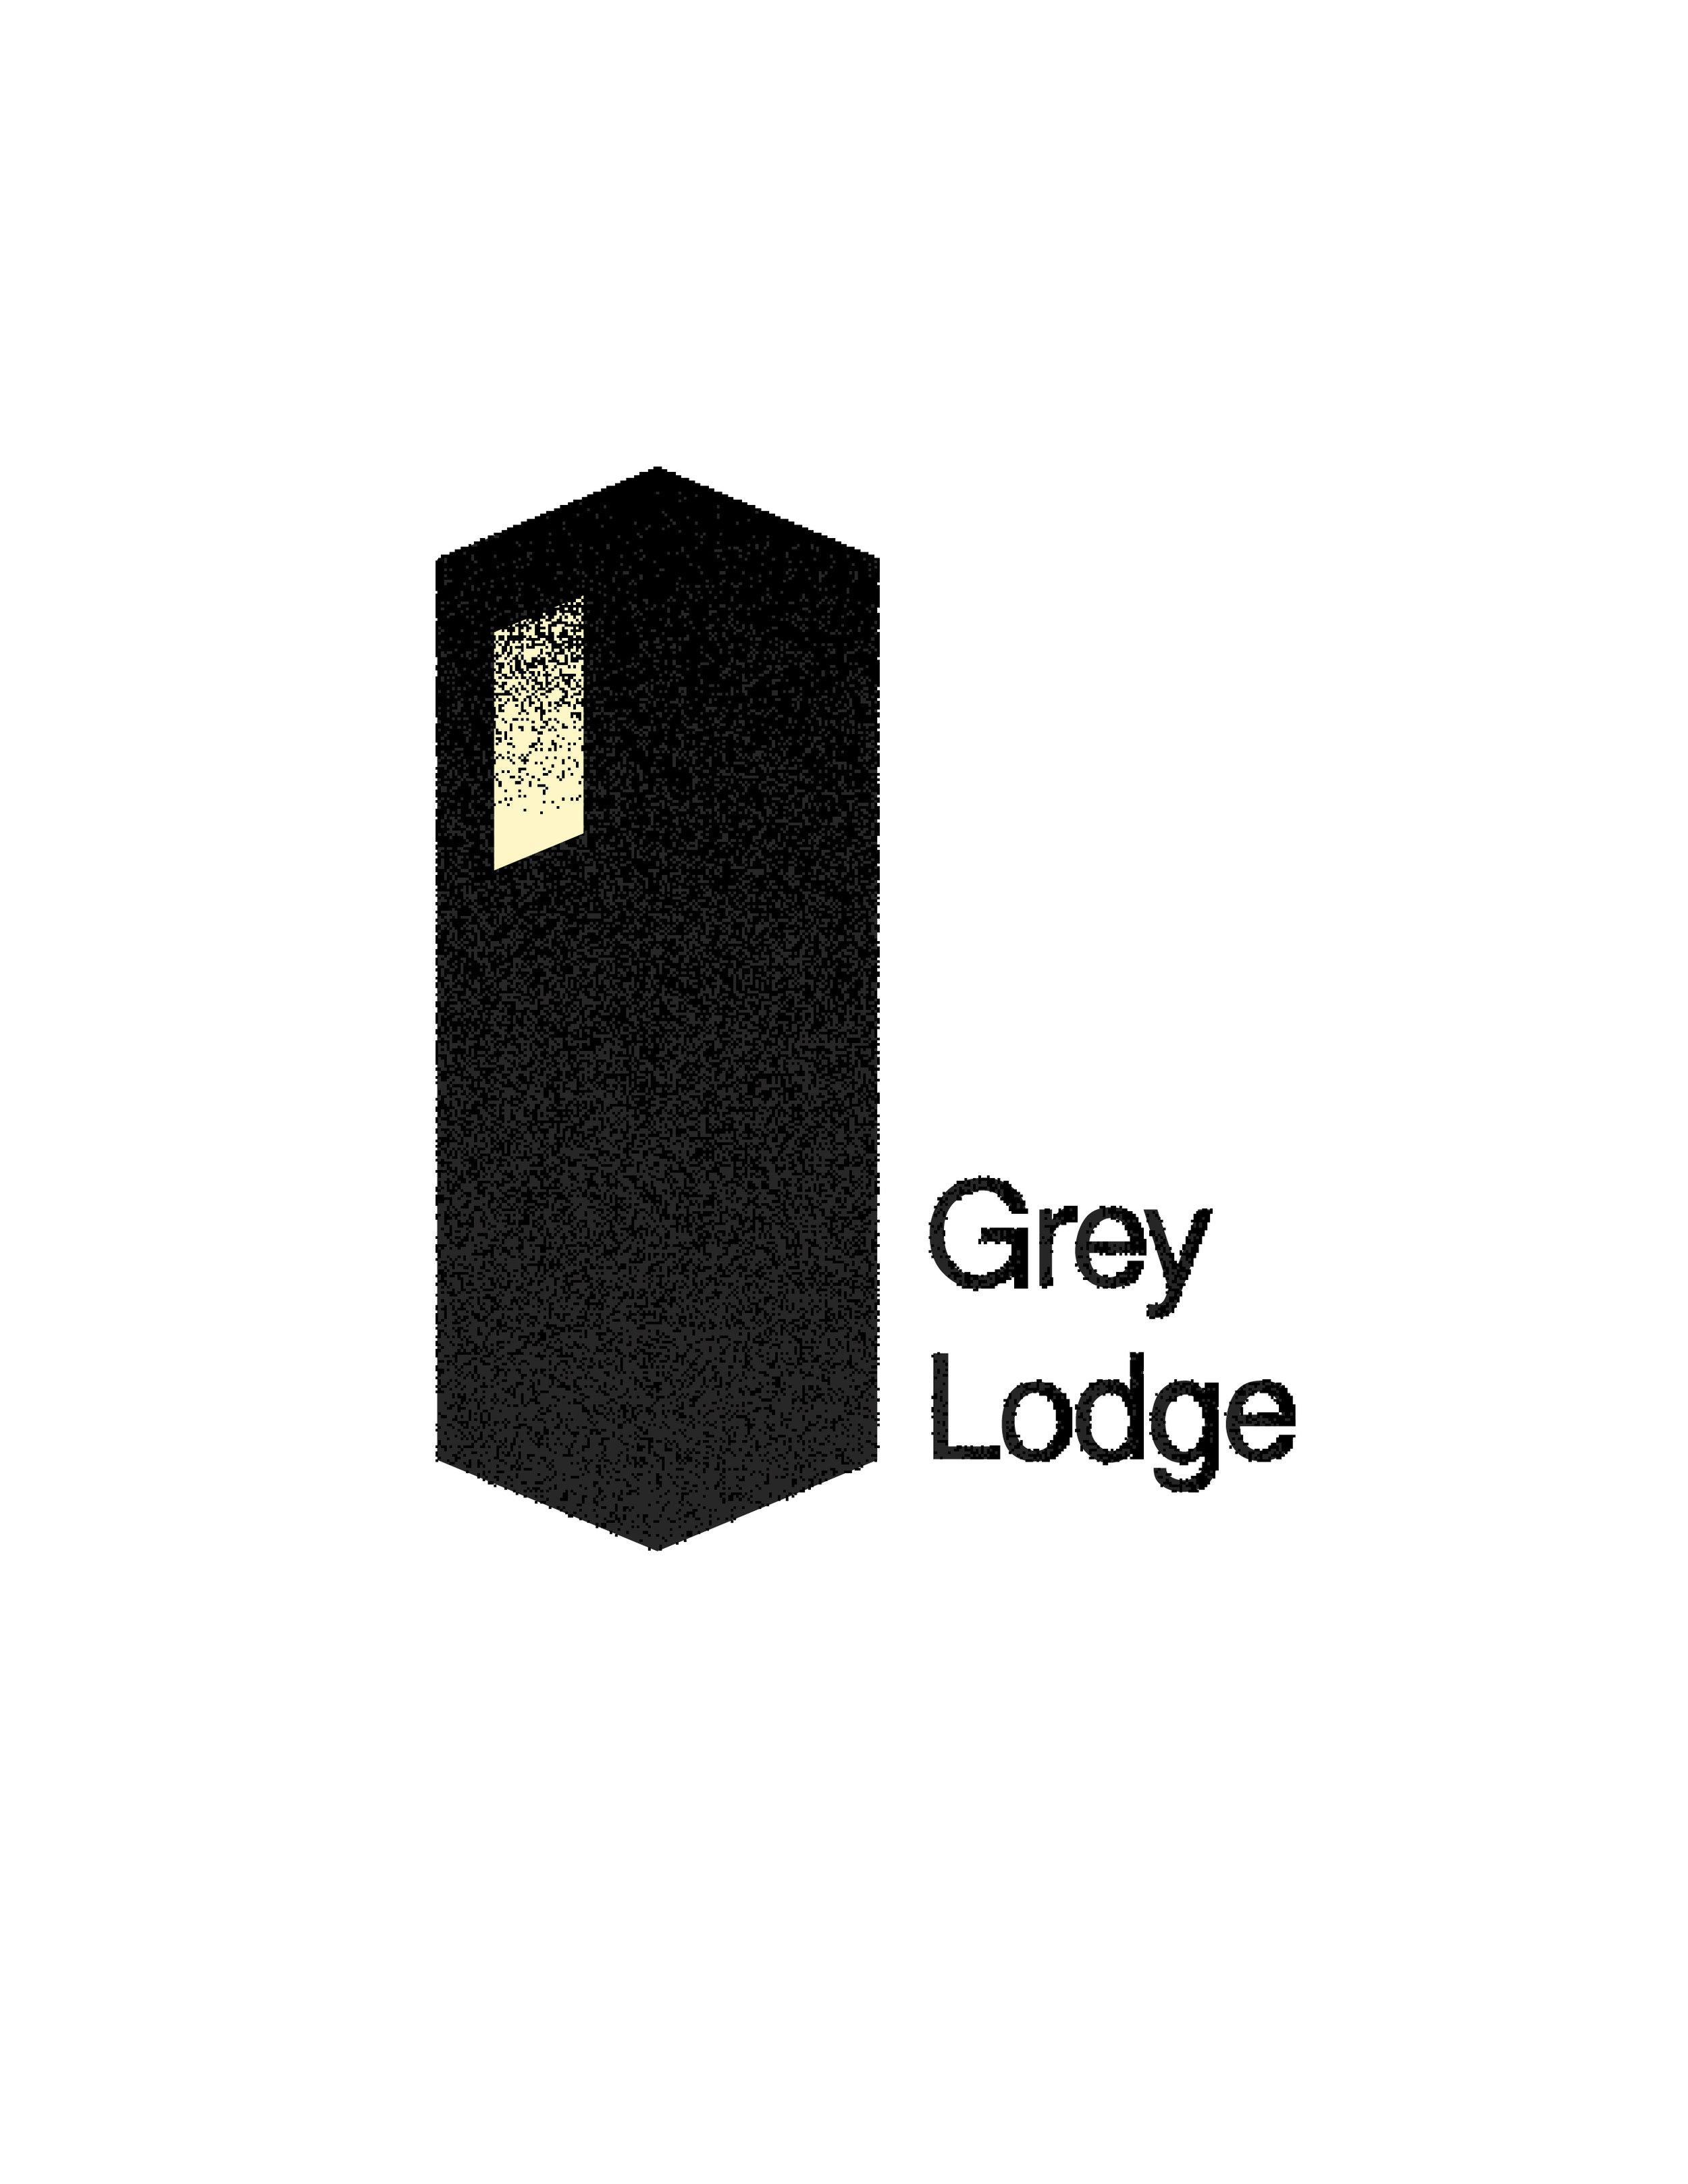 Grey Lodge-01.jpg